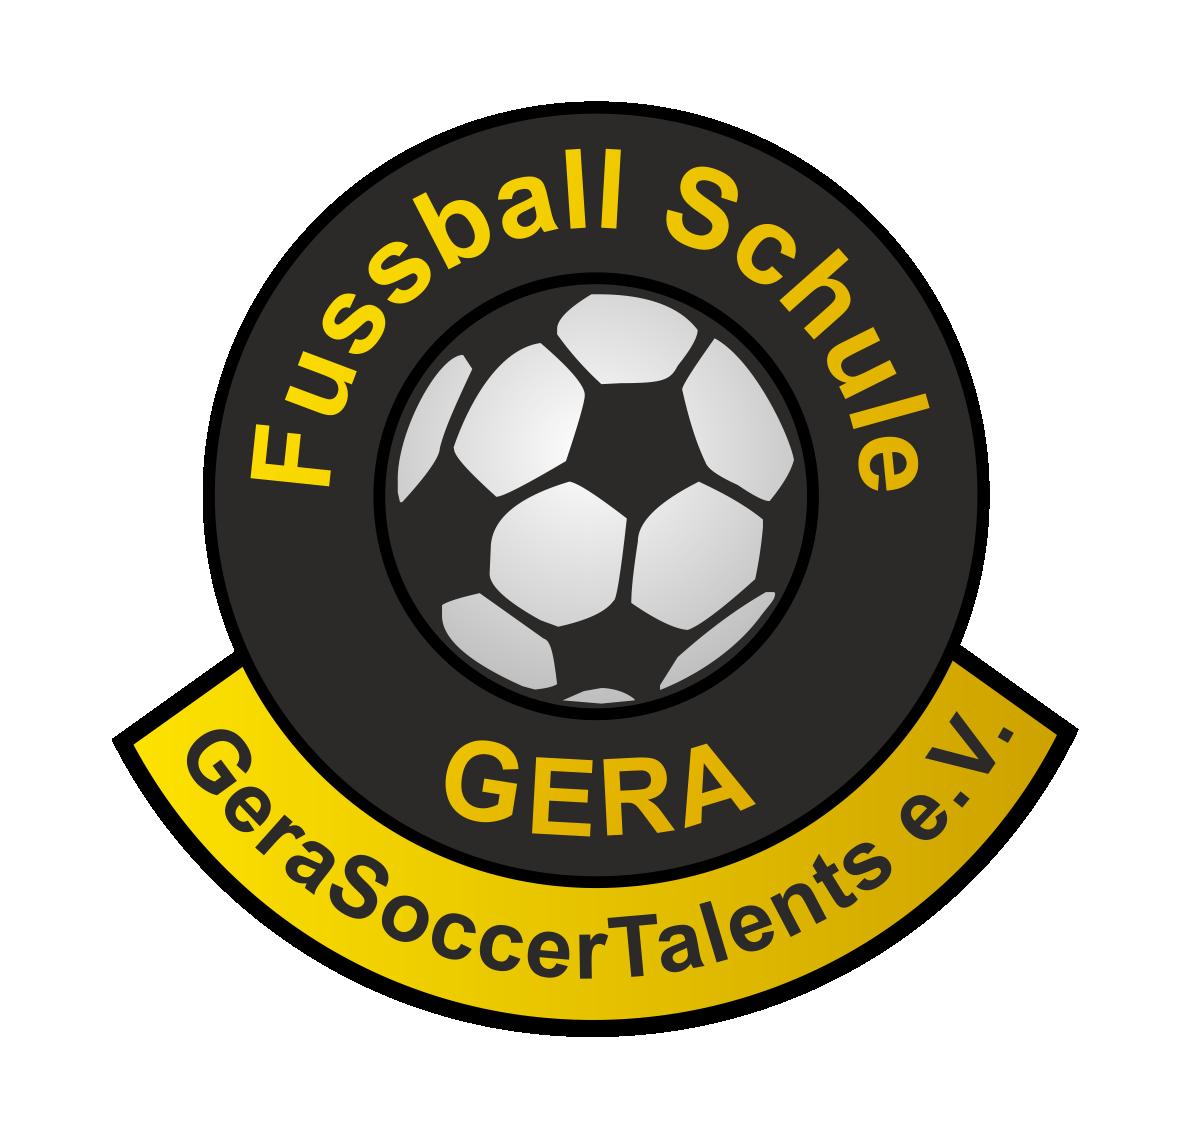 Fussballschule Gera